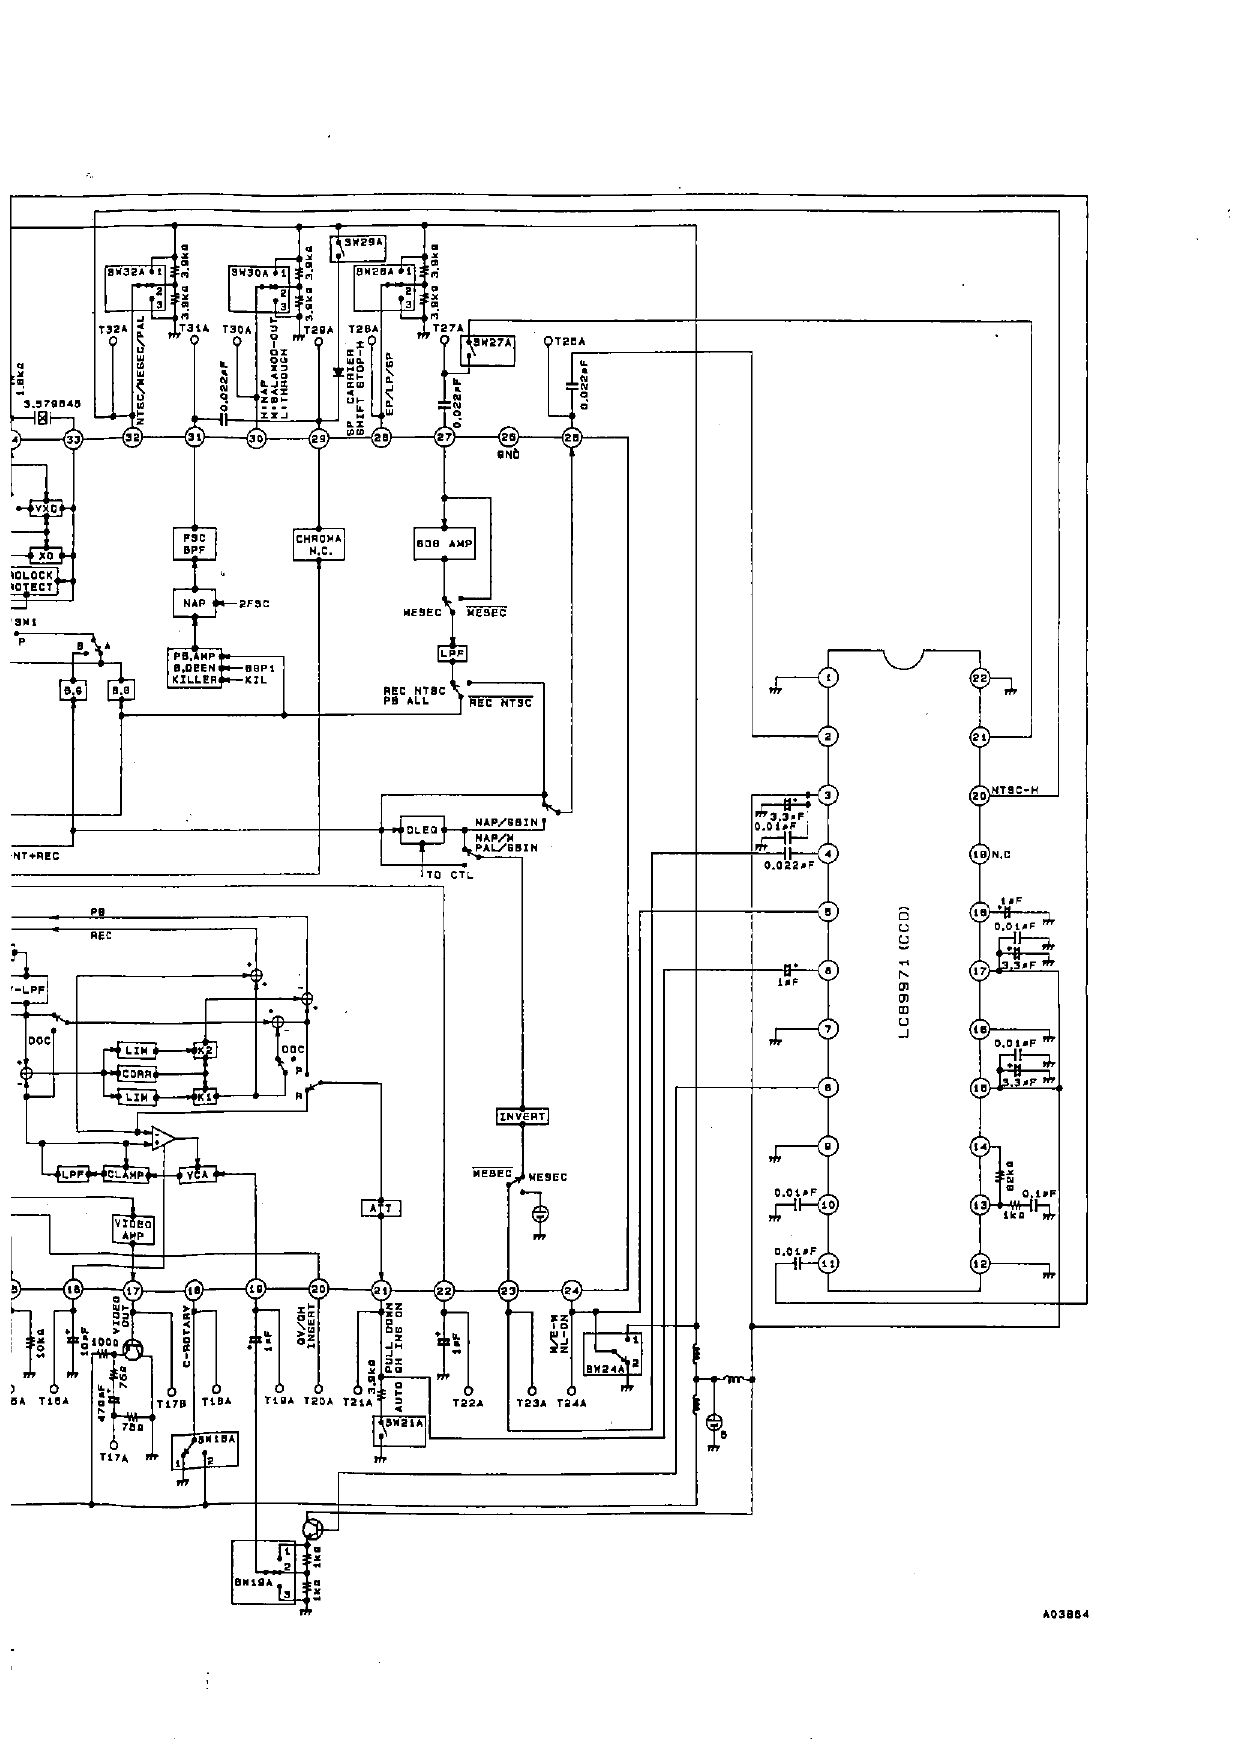 LA7440M 전자부품, 판매, 대치품